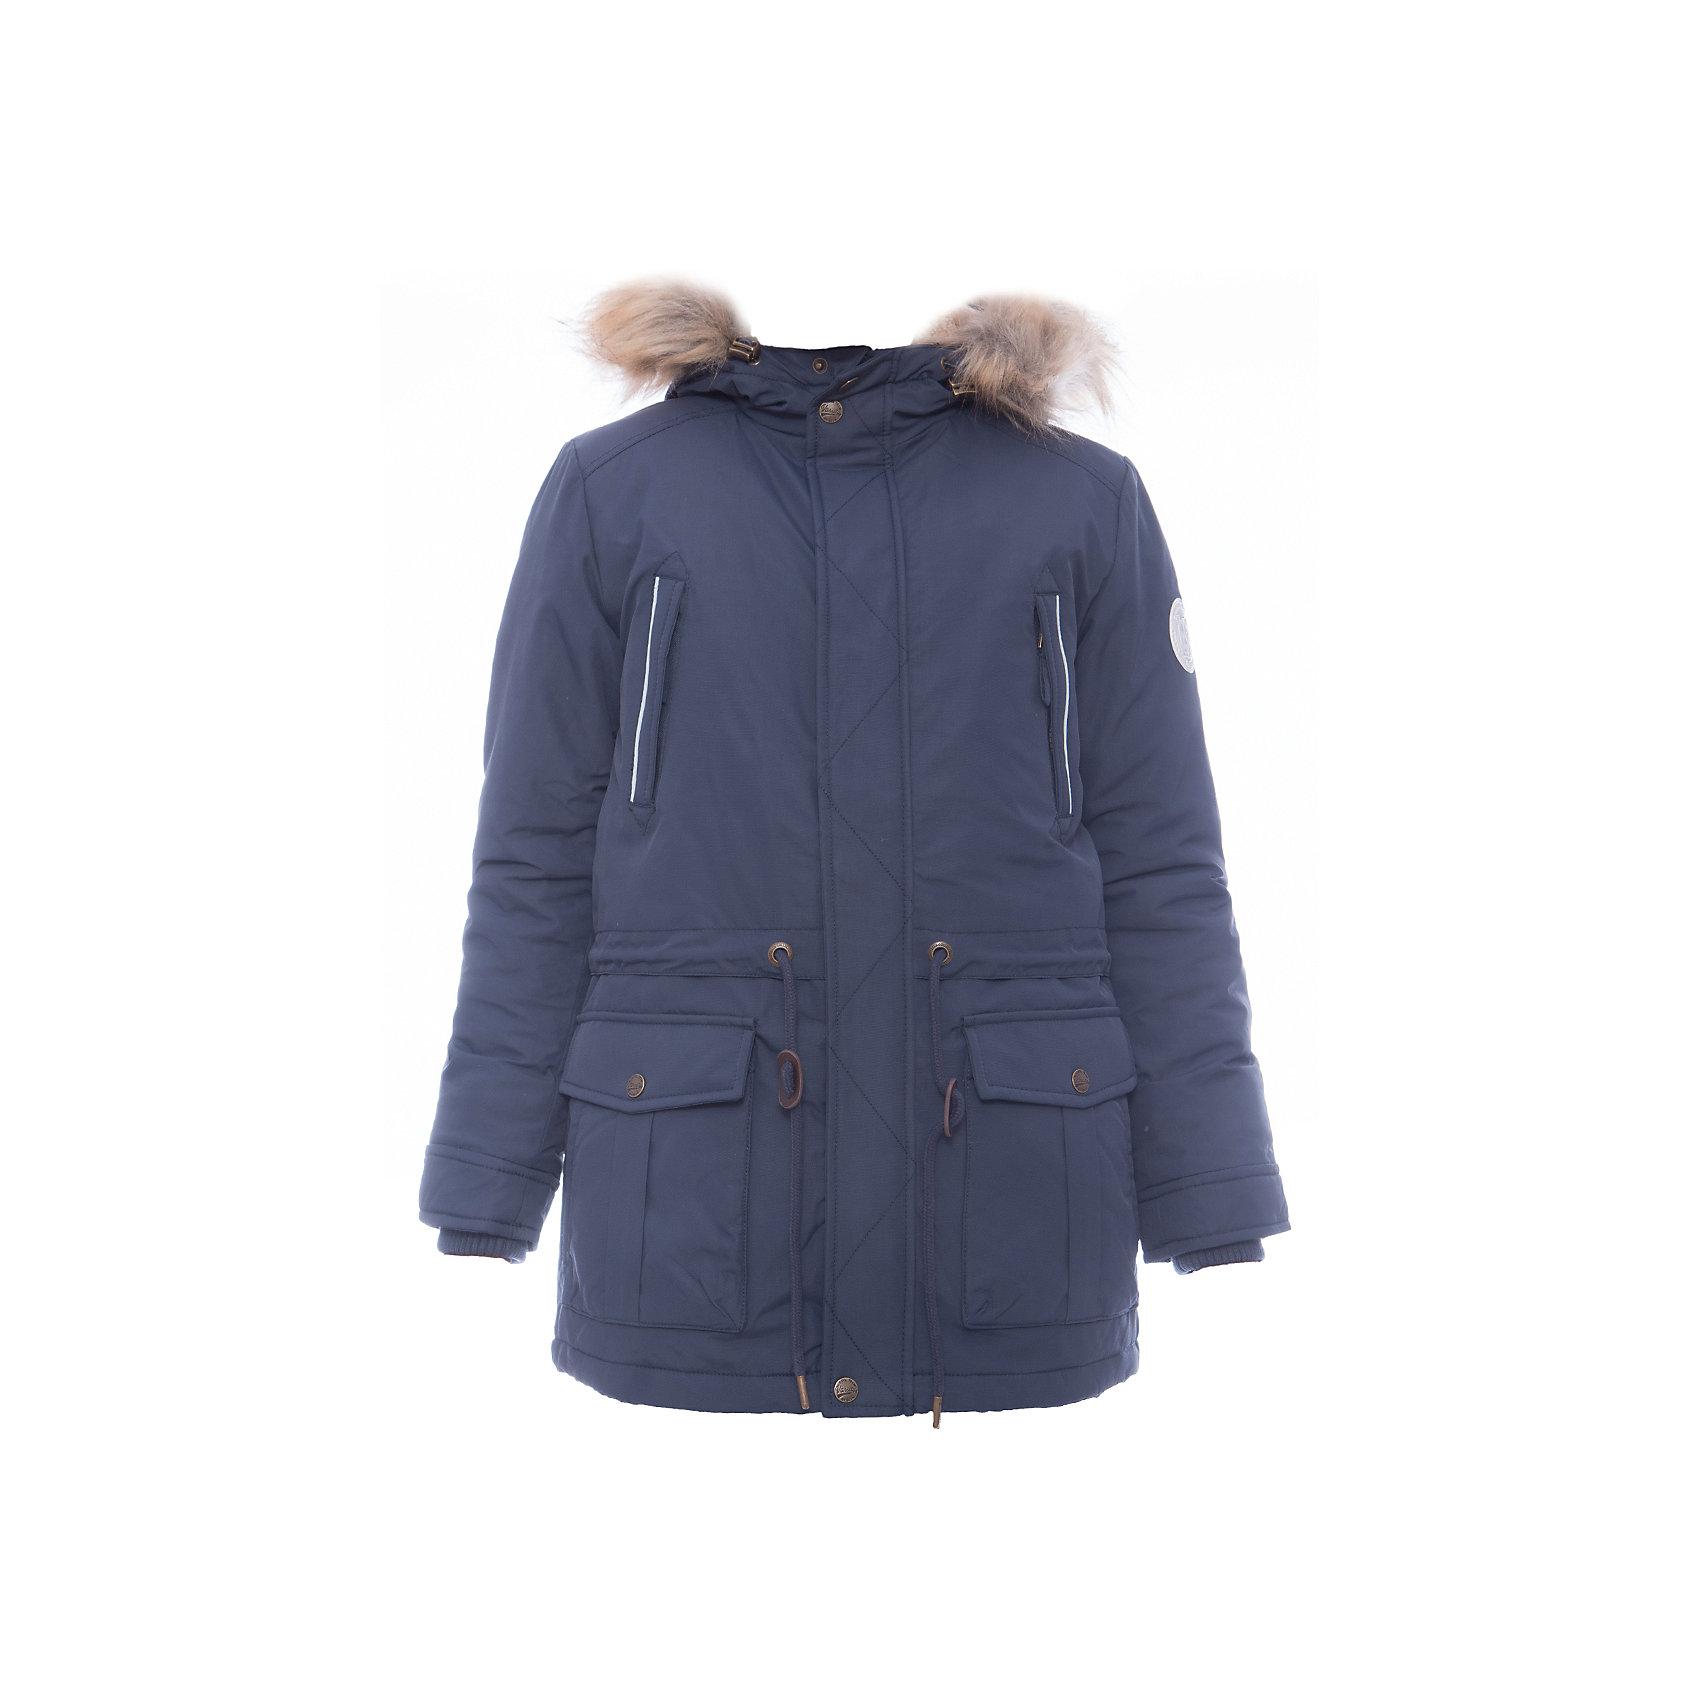 Куртка SELA для мальчикаВерхняя одежда<br>Куртка SELA для мальчика<br>Состав:<br>100% нейлон<br><br>Ширина мм: 356<br>Глубина мм: 10<br>Высота мм: 245<br>Вес г: 519<br>Цвет: синий<br>Возраст от месяцев: 132<br>Возраст до месяцев: 144<br>Пол: Мужской<br>Возраст: Детский<br>Размер: 152,122,128,140<br>SKU: 7136688